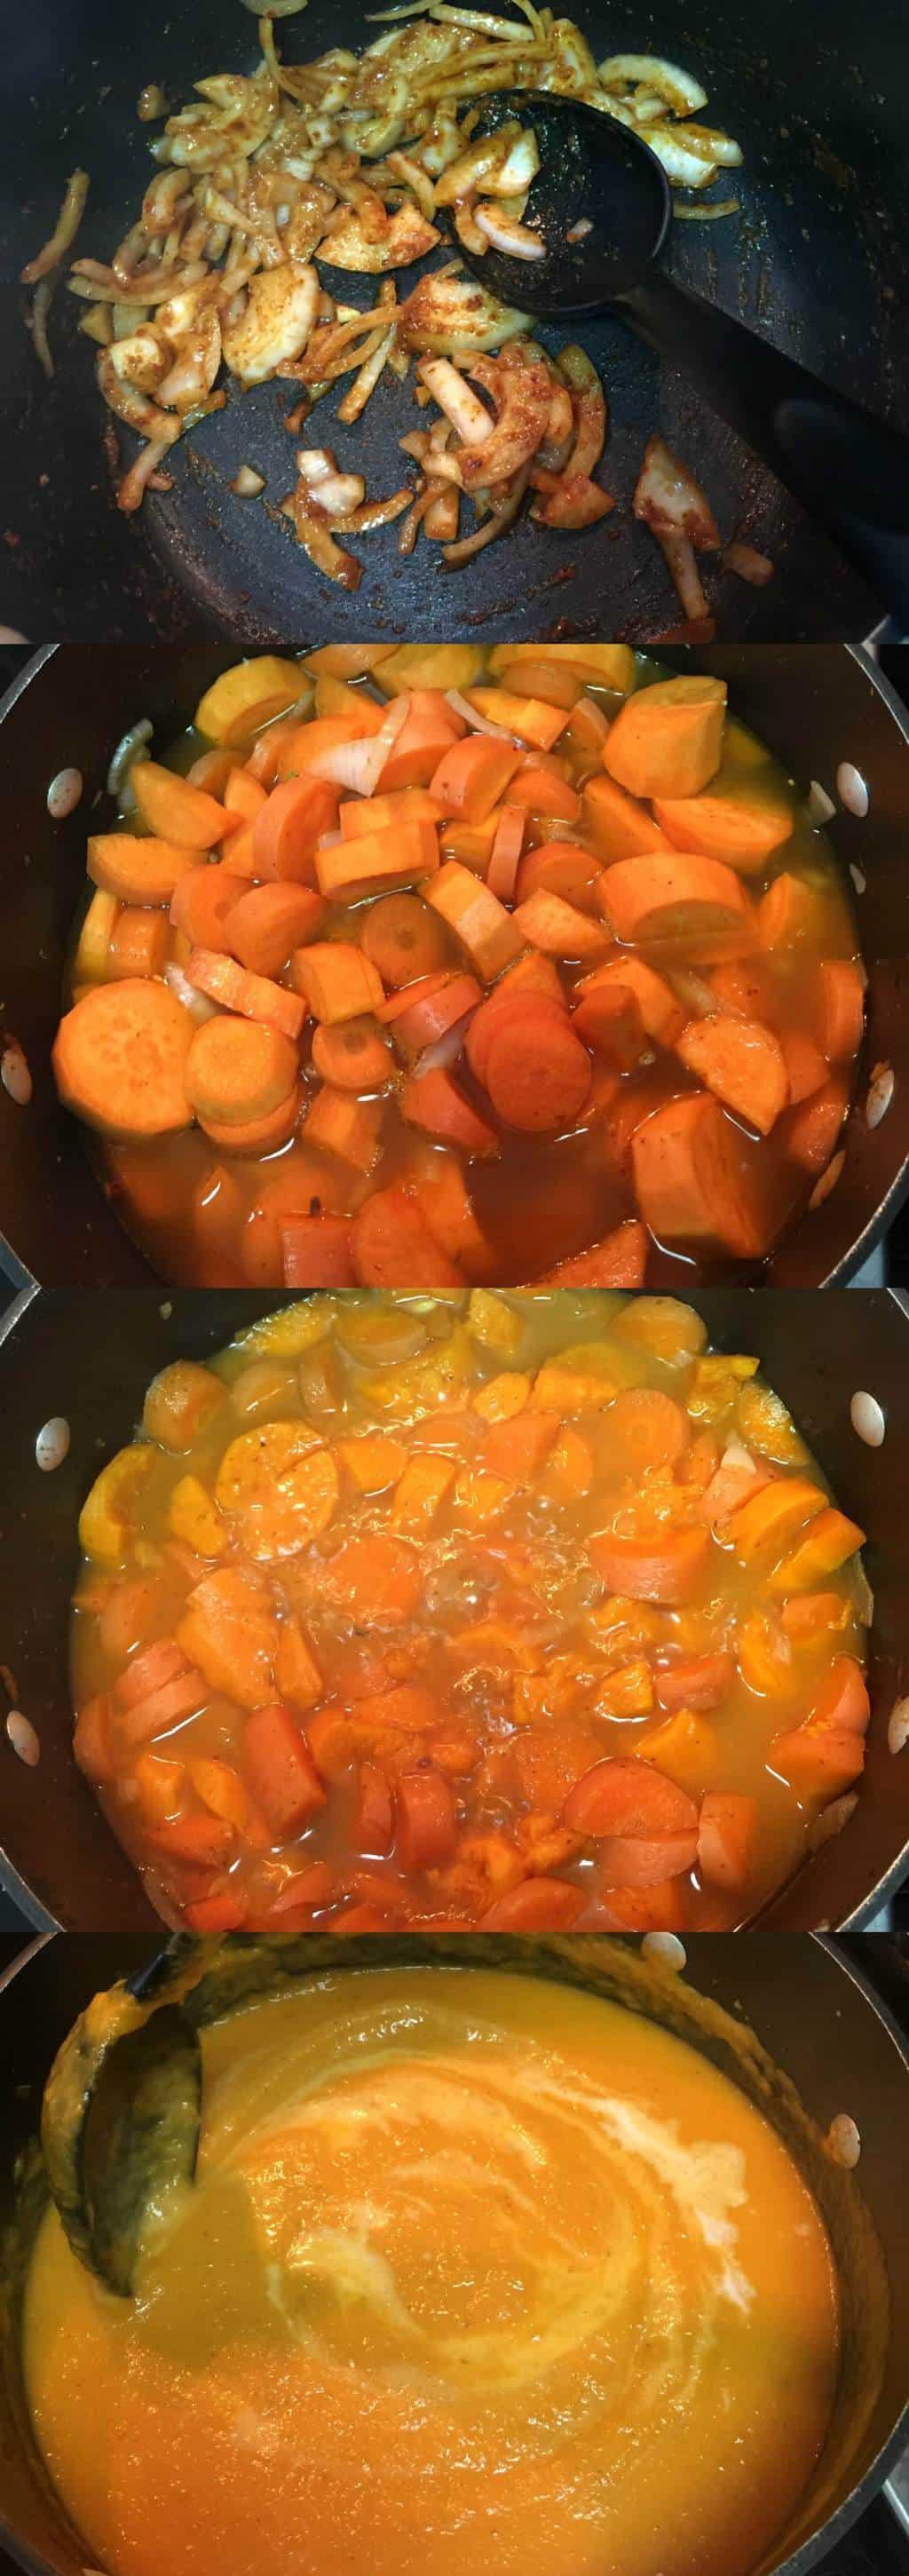 Making a Spicy Thai Carrot and Sweet Potato Soup #vegan #lovingitvegan #appetizer #soups